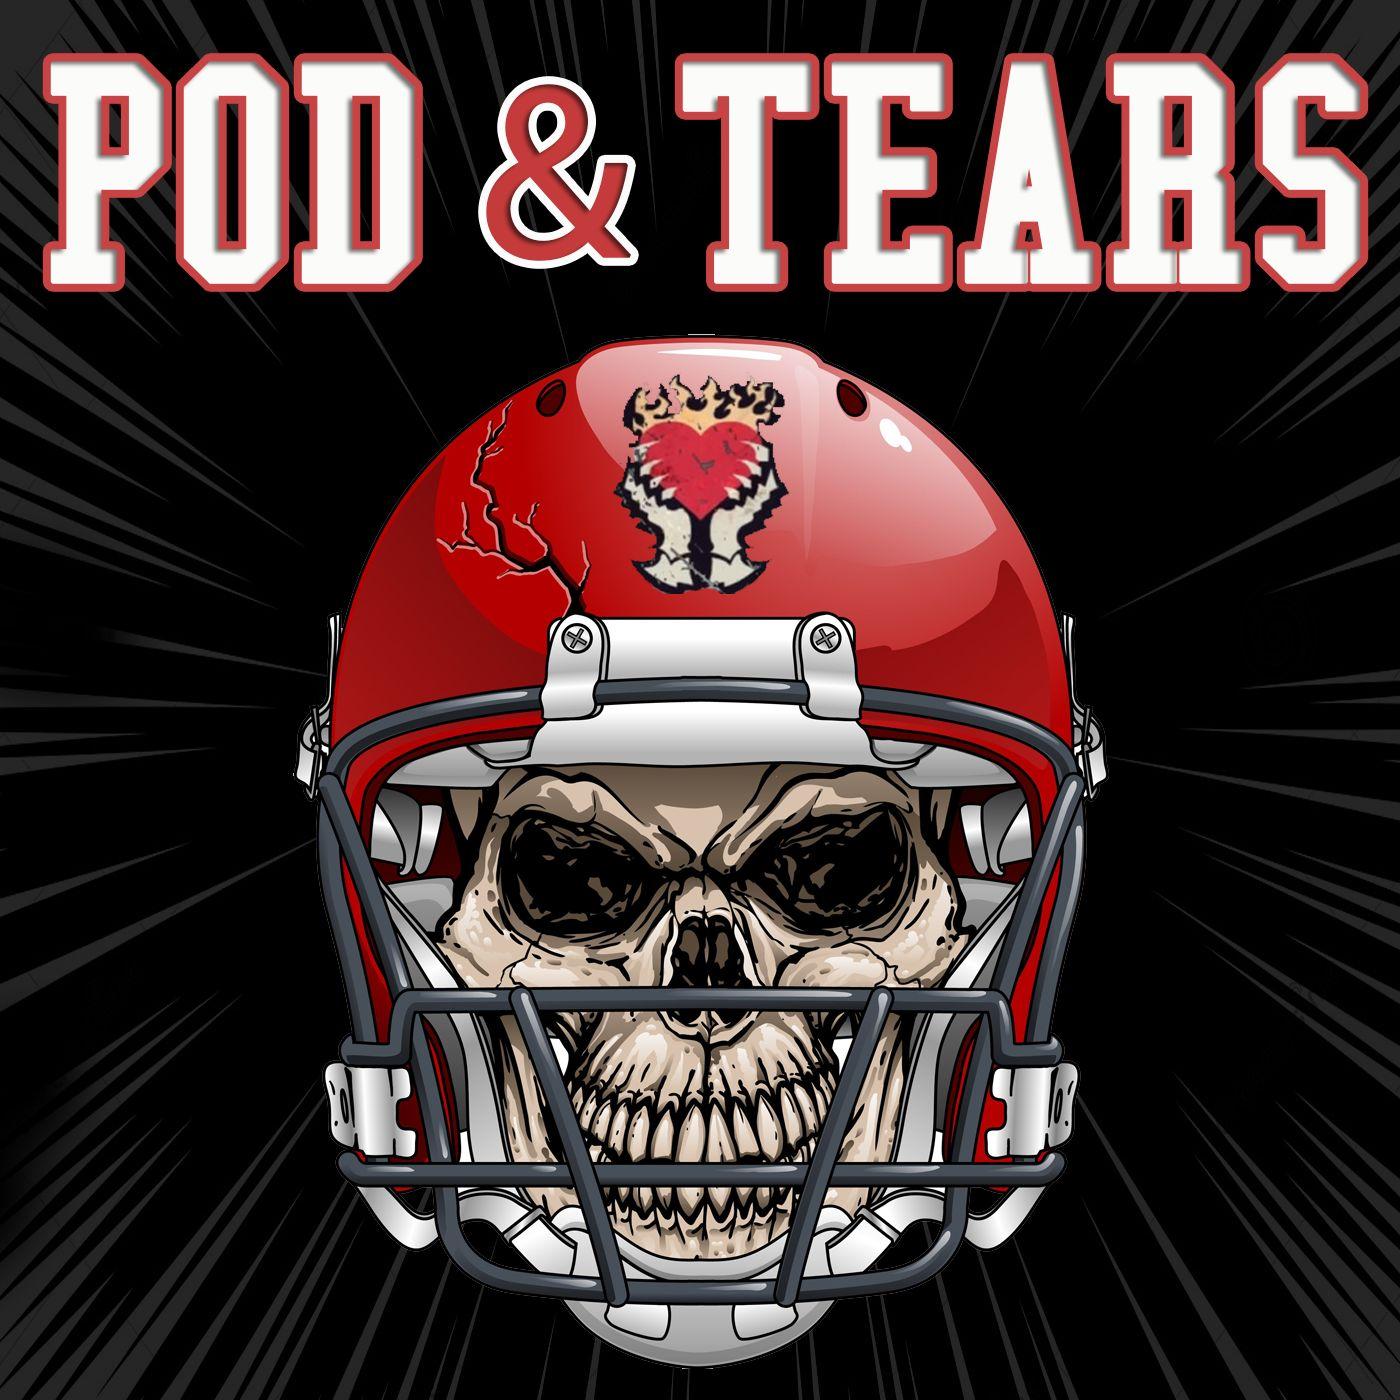 Pod and Tears